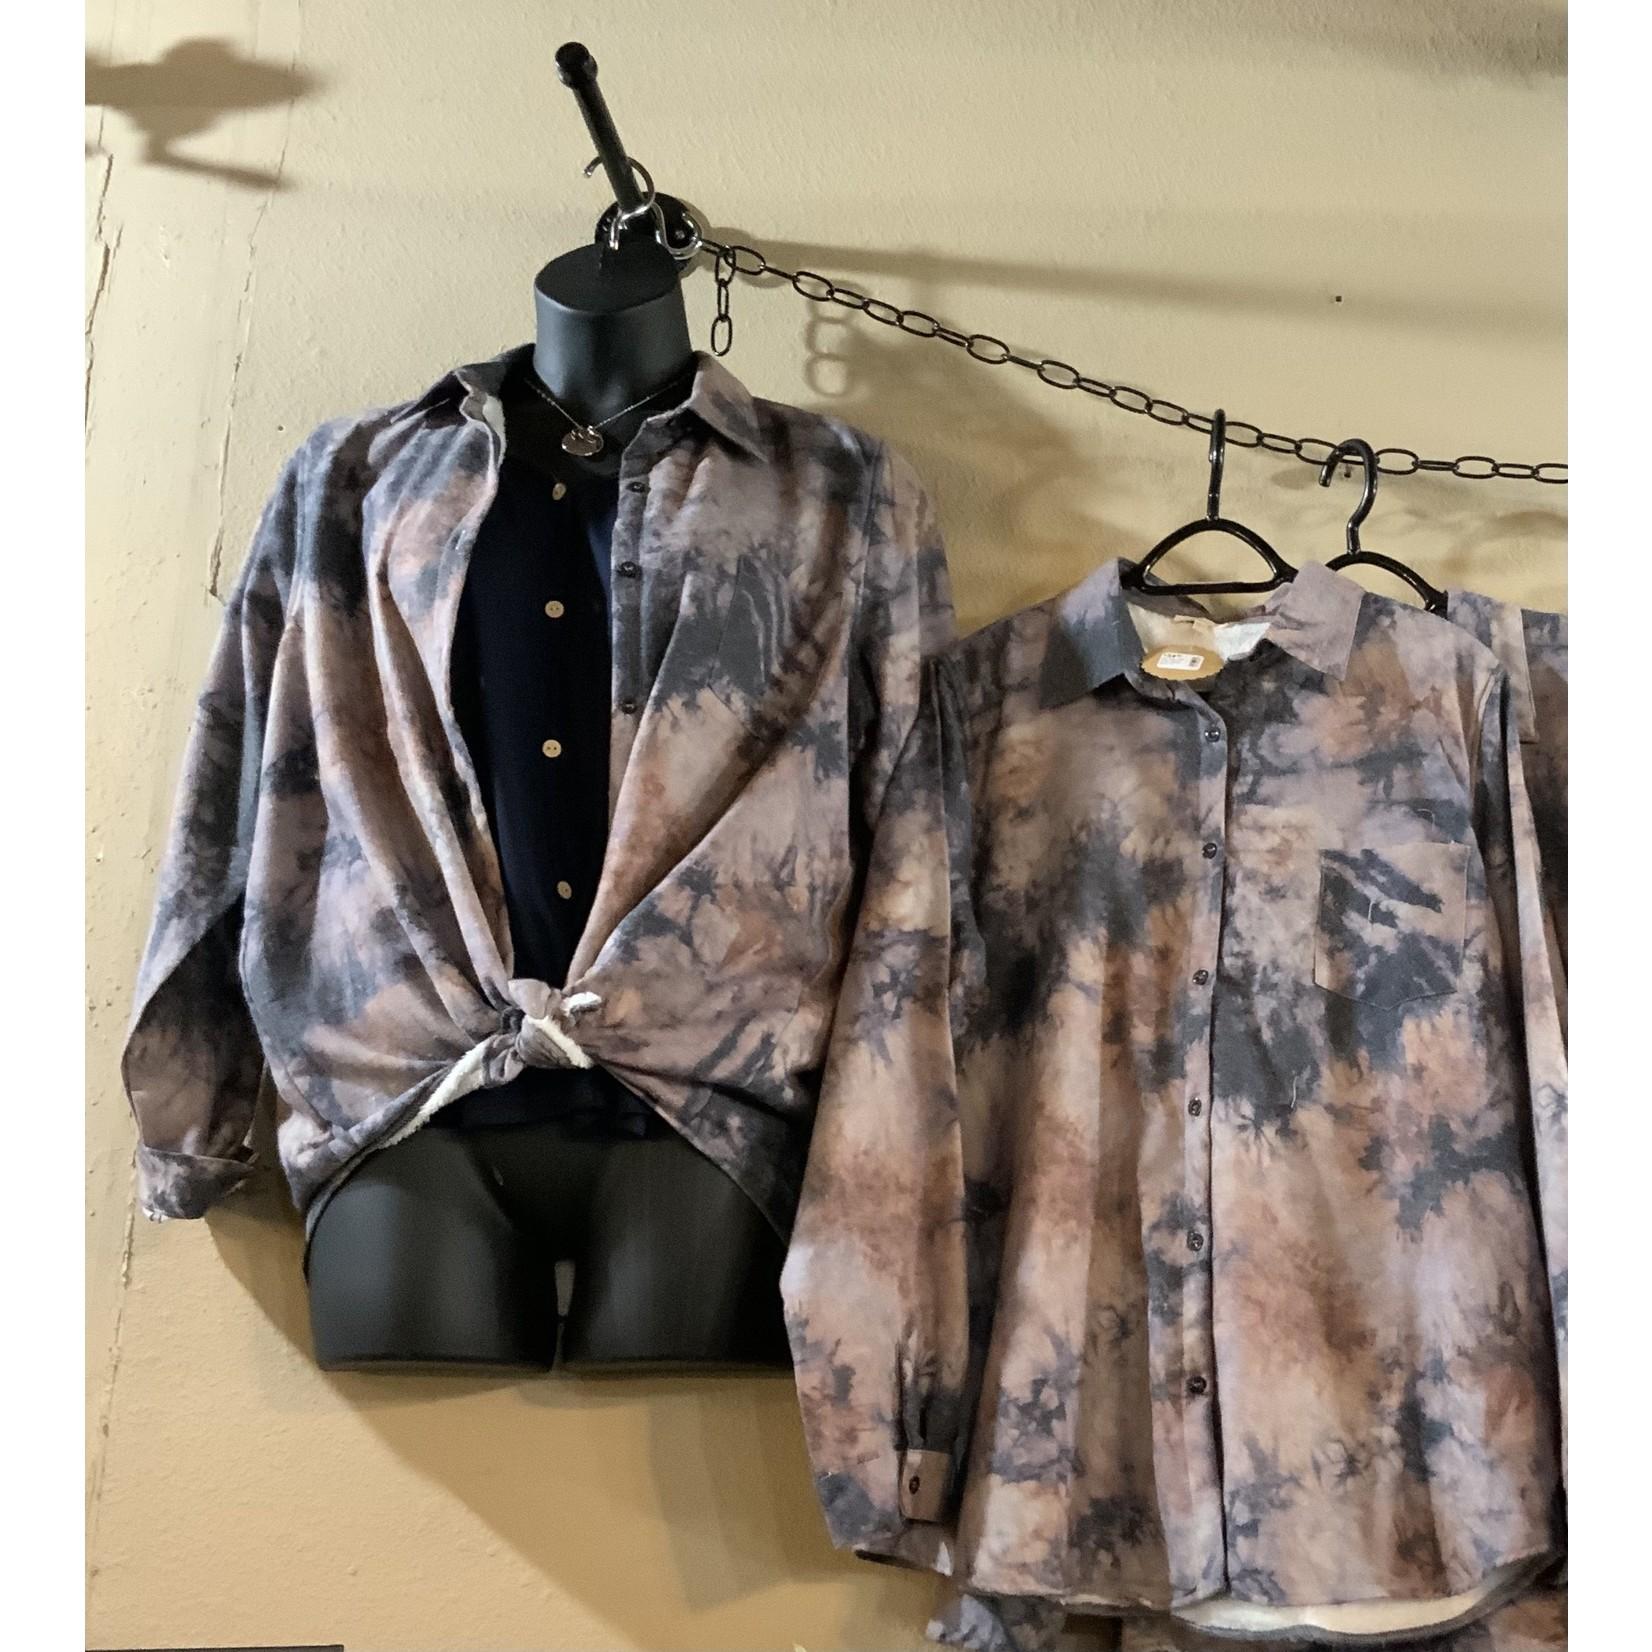 Clique 1 Co. PS: Tye-Dye Print Fleece Lined Jacket